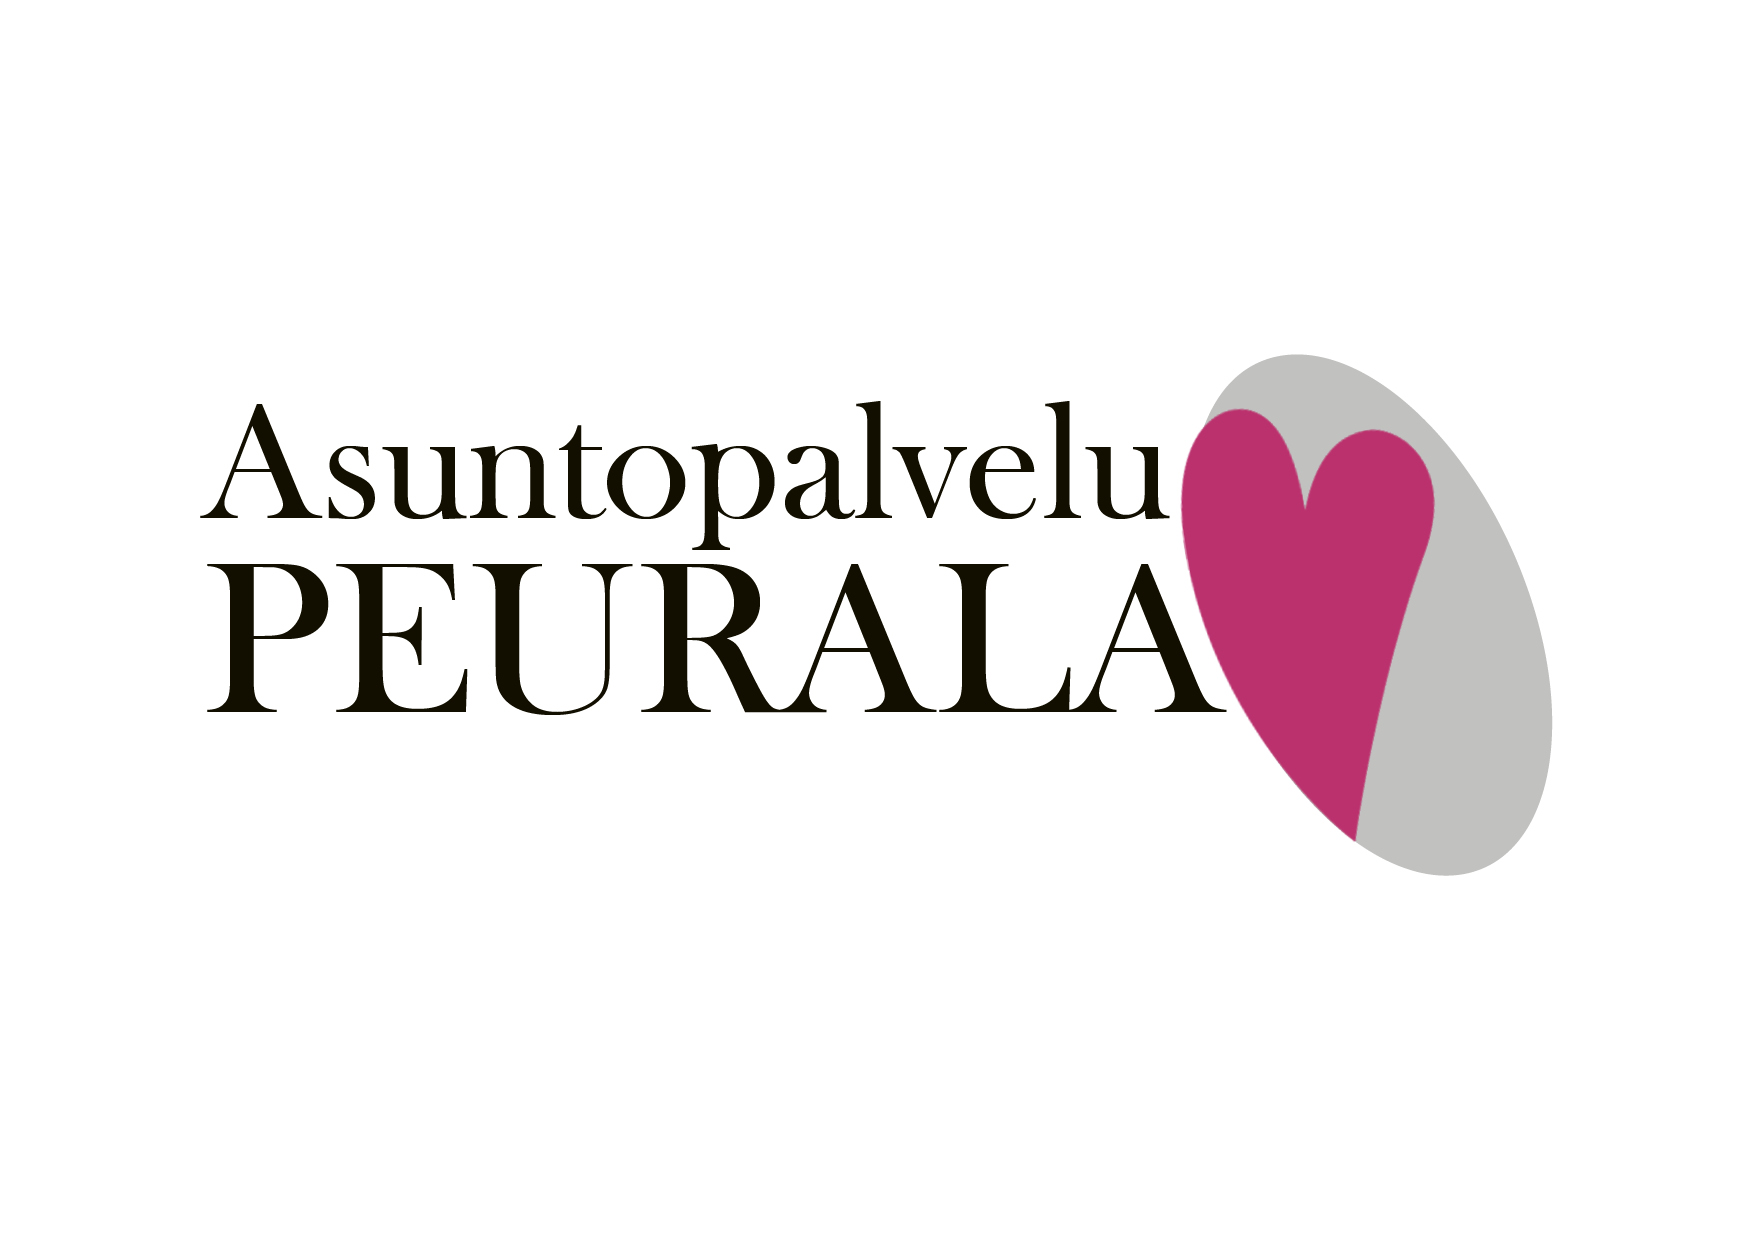 Asuntopalvelu Peurala